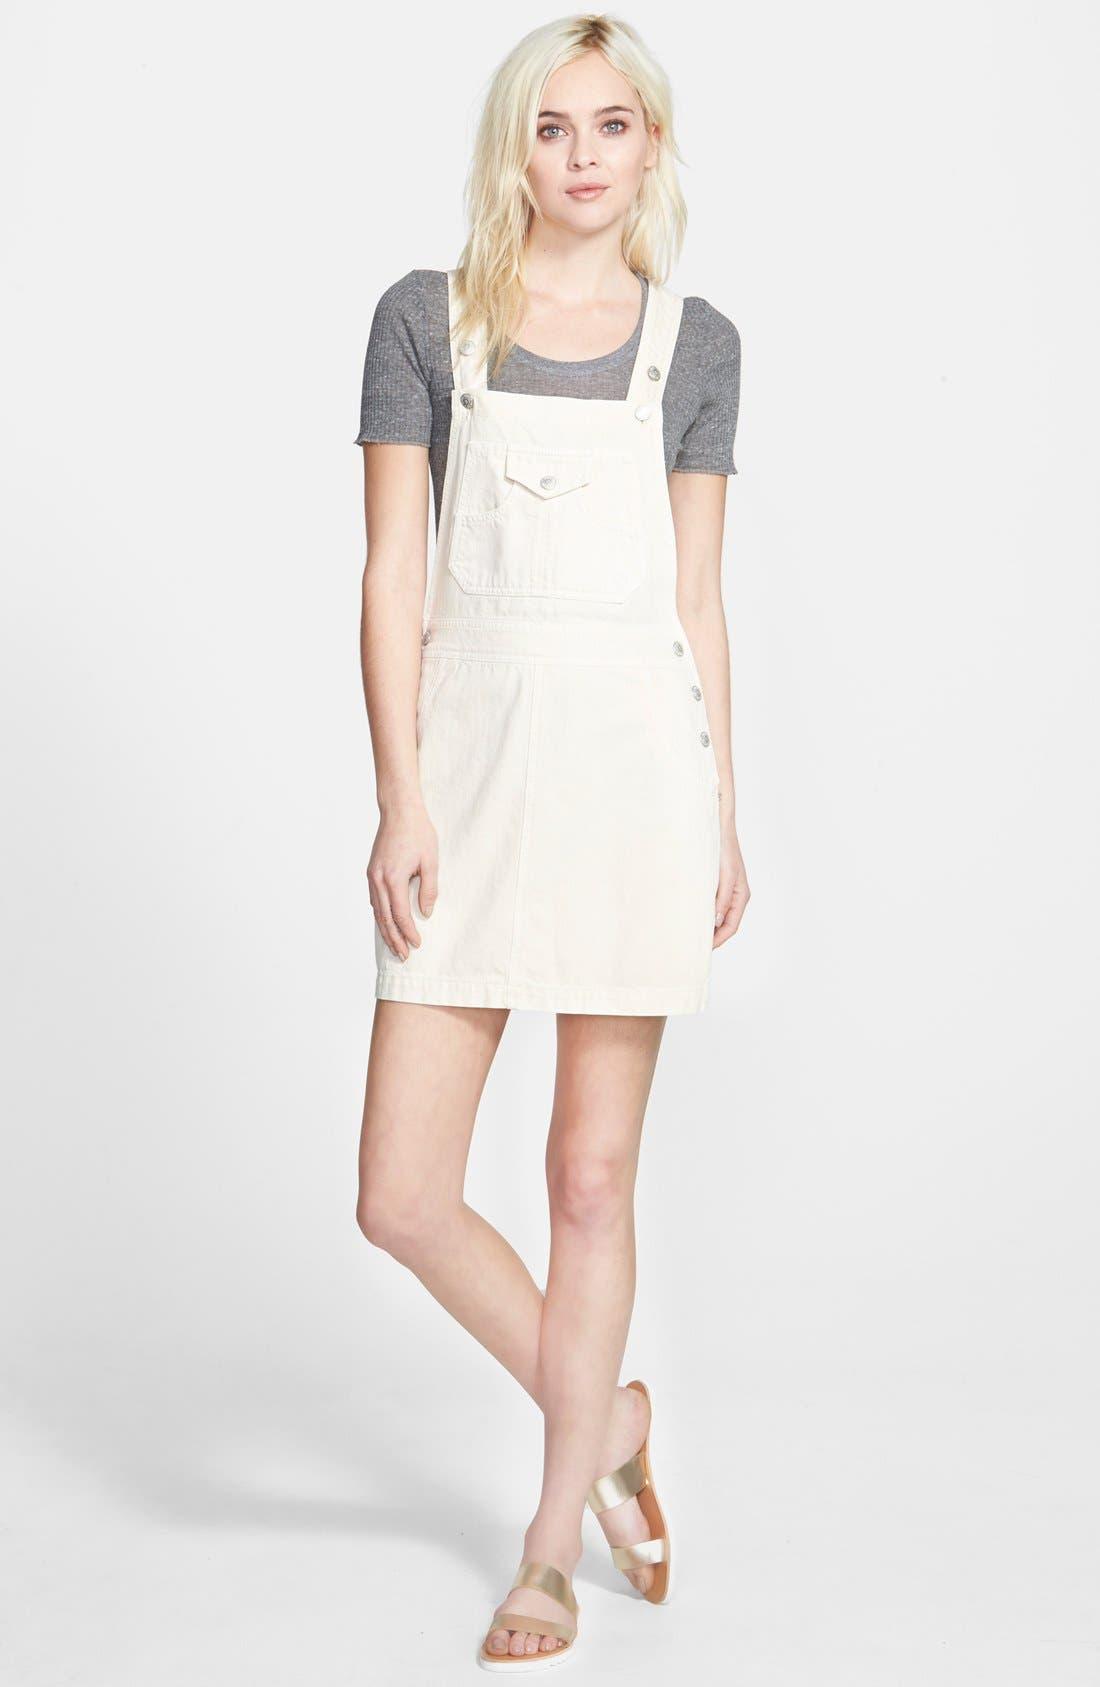 Alexa Chung for AG 'The Gillian' Overalls Dress, Main, color, 100